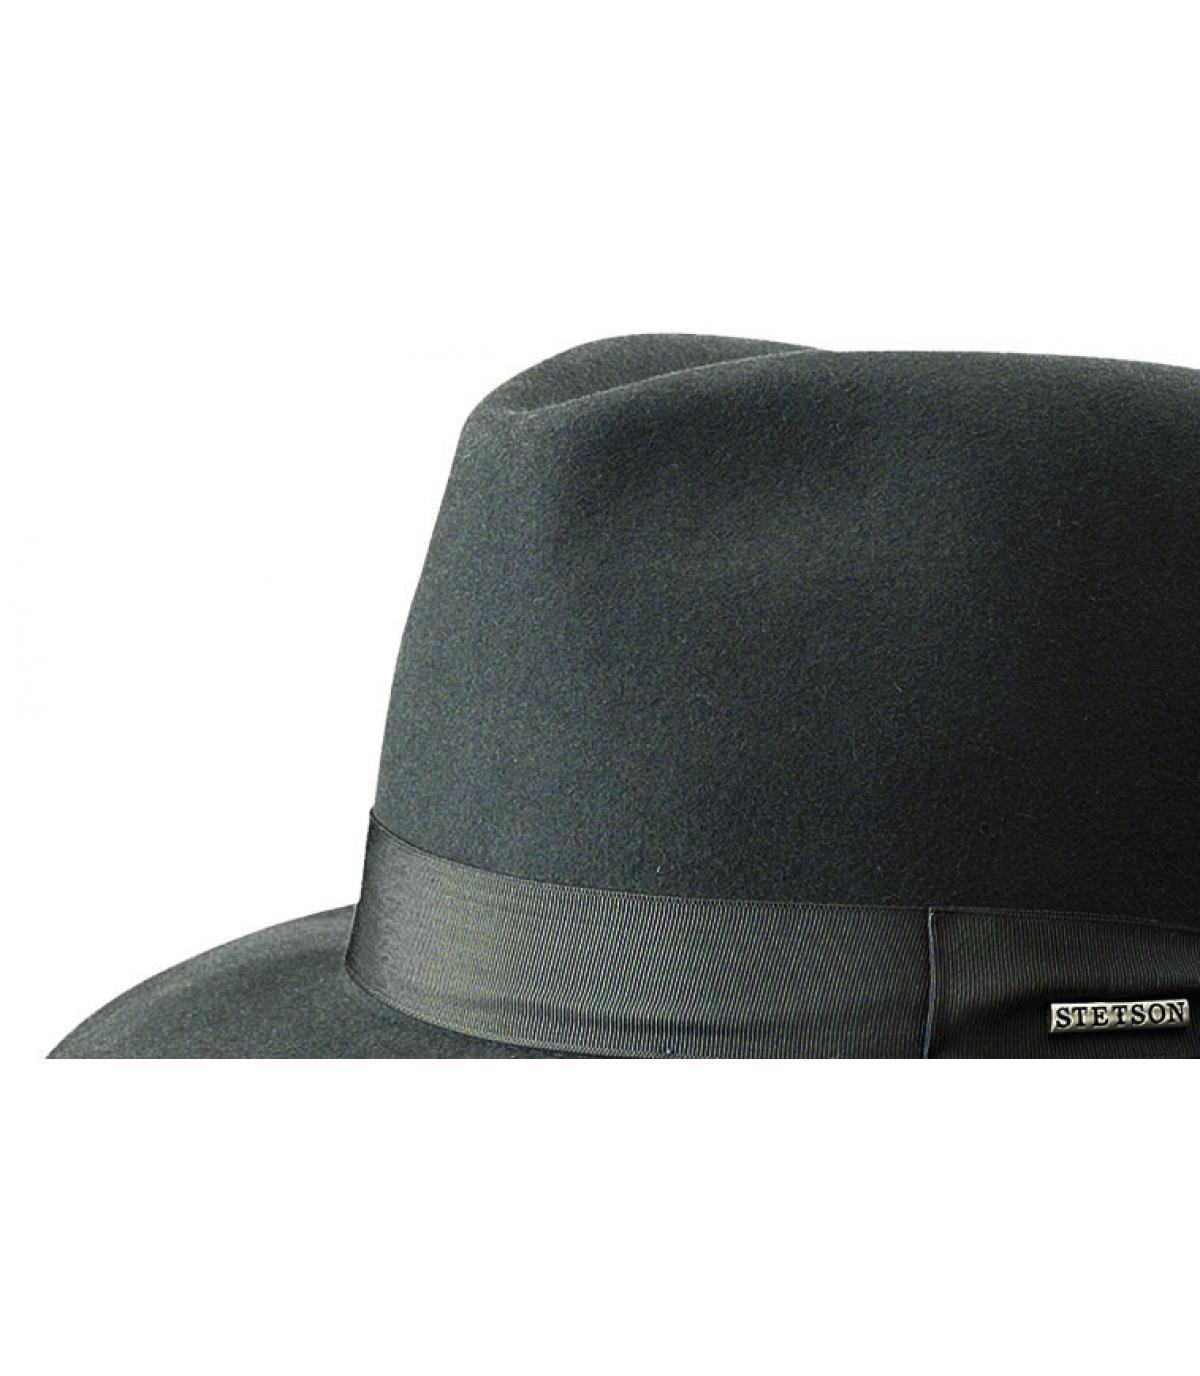 Stetson fedora hat - Penn furfelt grey by Stetson. 7812937f5c3